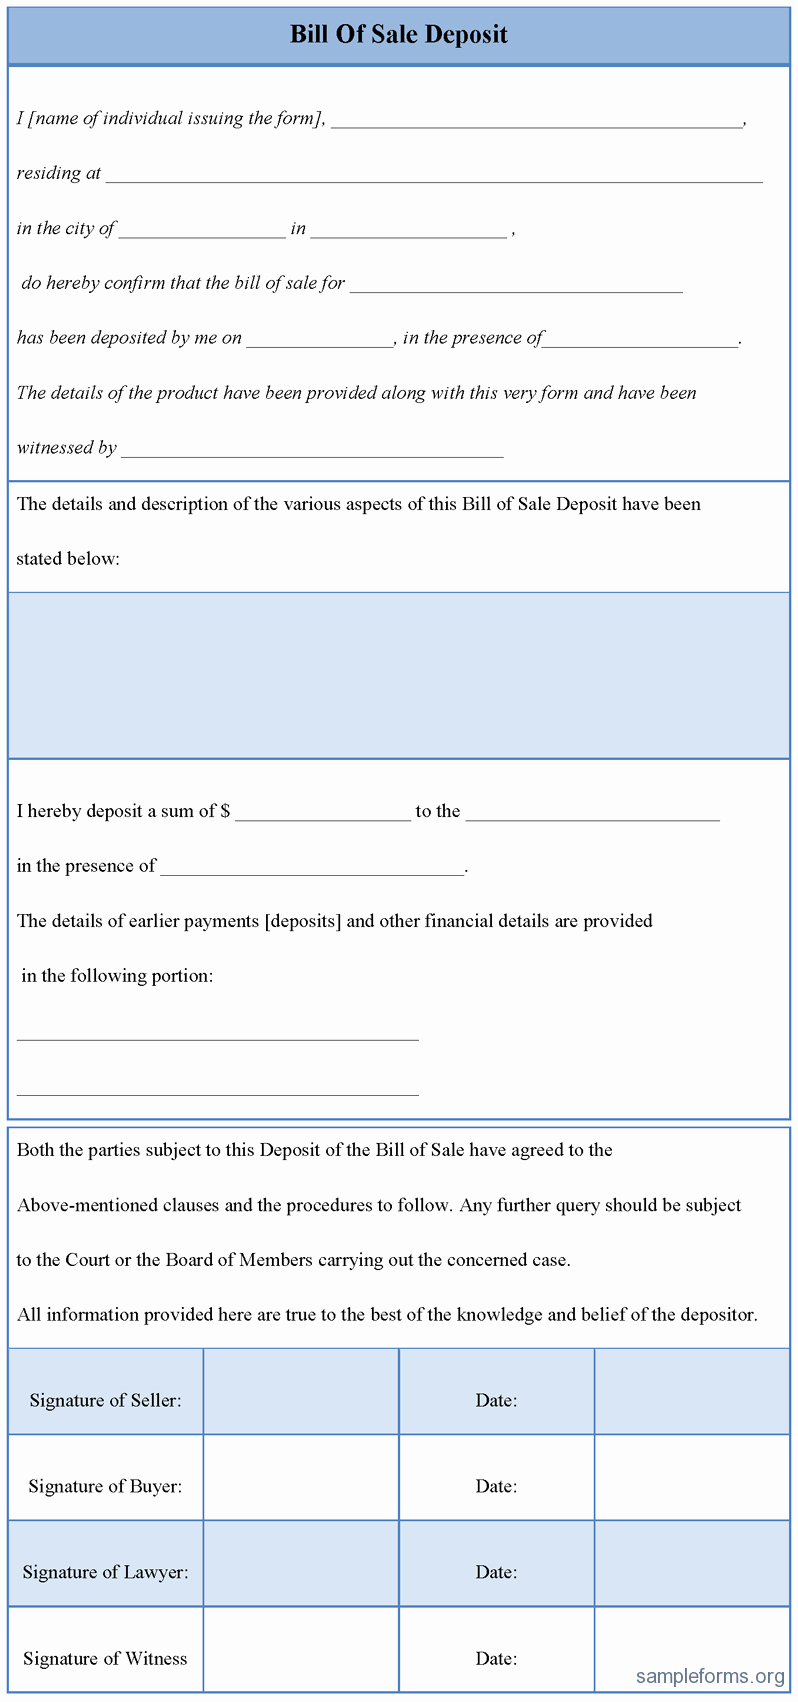 Bill Of Sale format Sample New Bill Of Sale Deposit form Sample forms